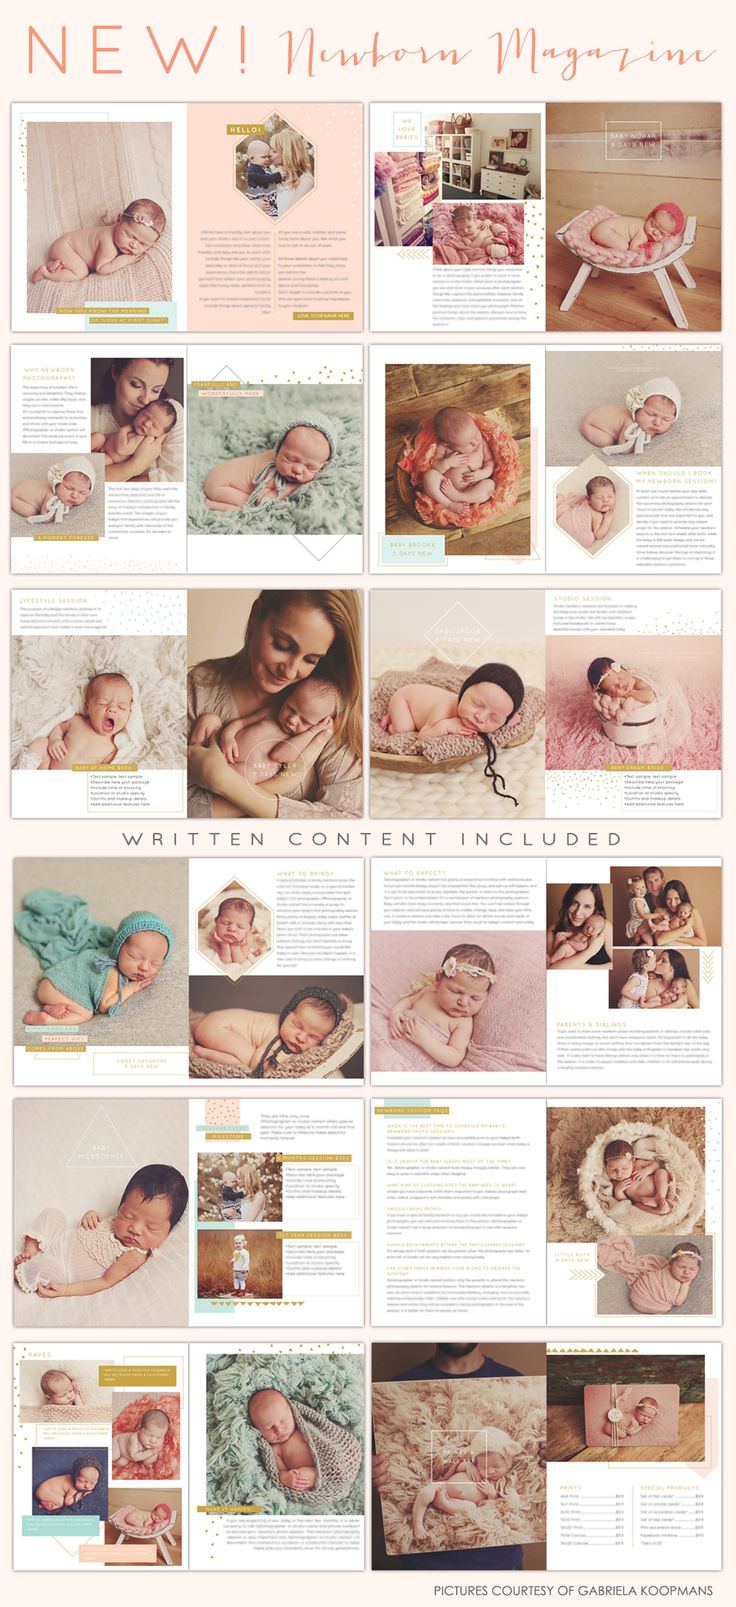 NEW!! Newborn Photography Magazine | Photoshop templates to create a professional studio magazine - use printed or digitally :)